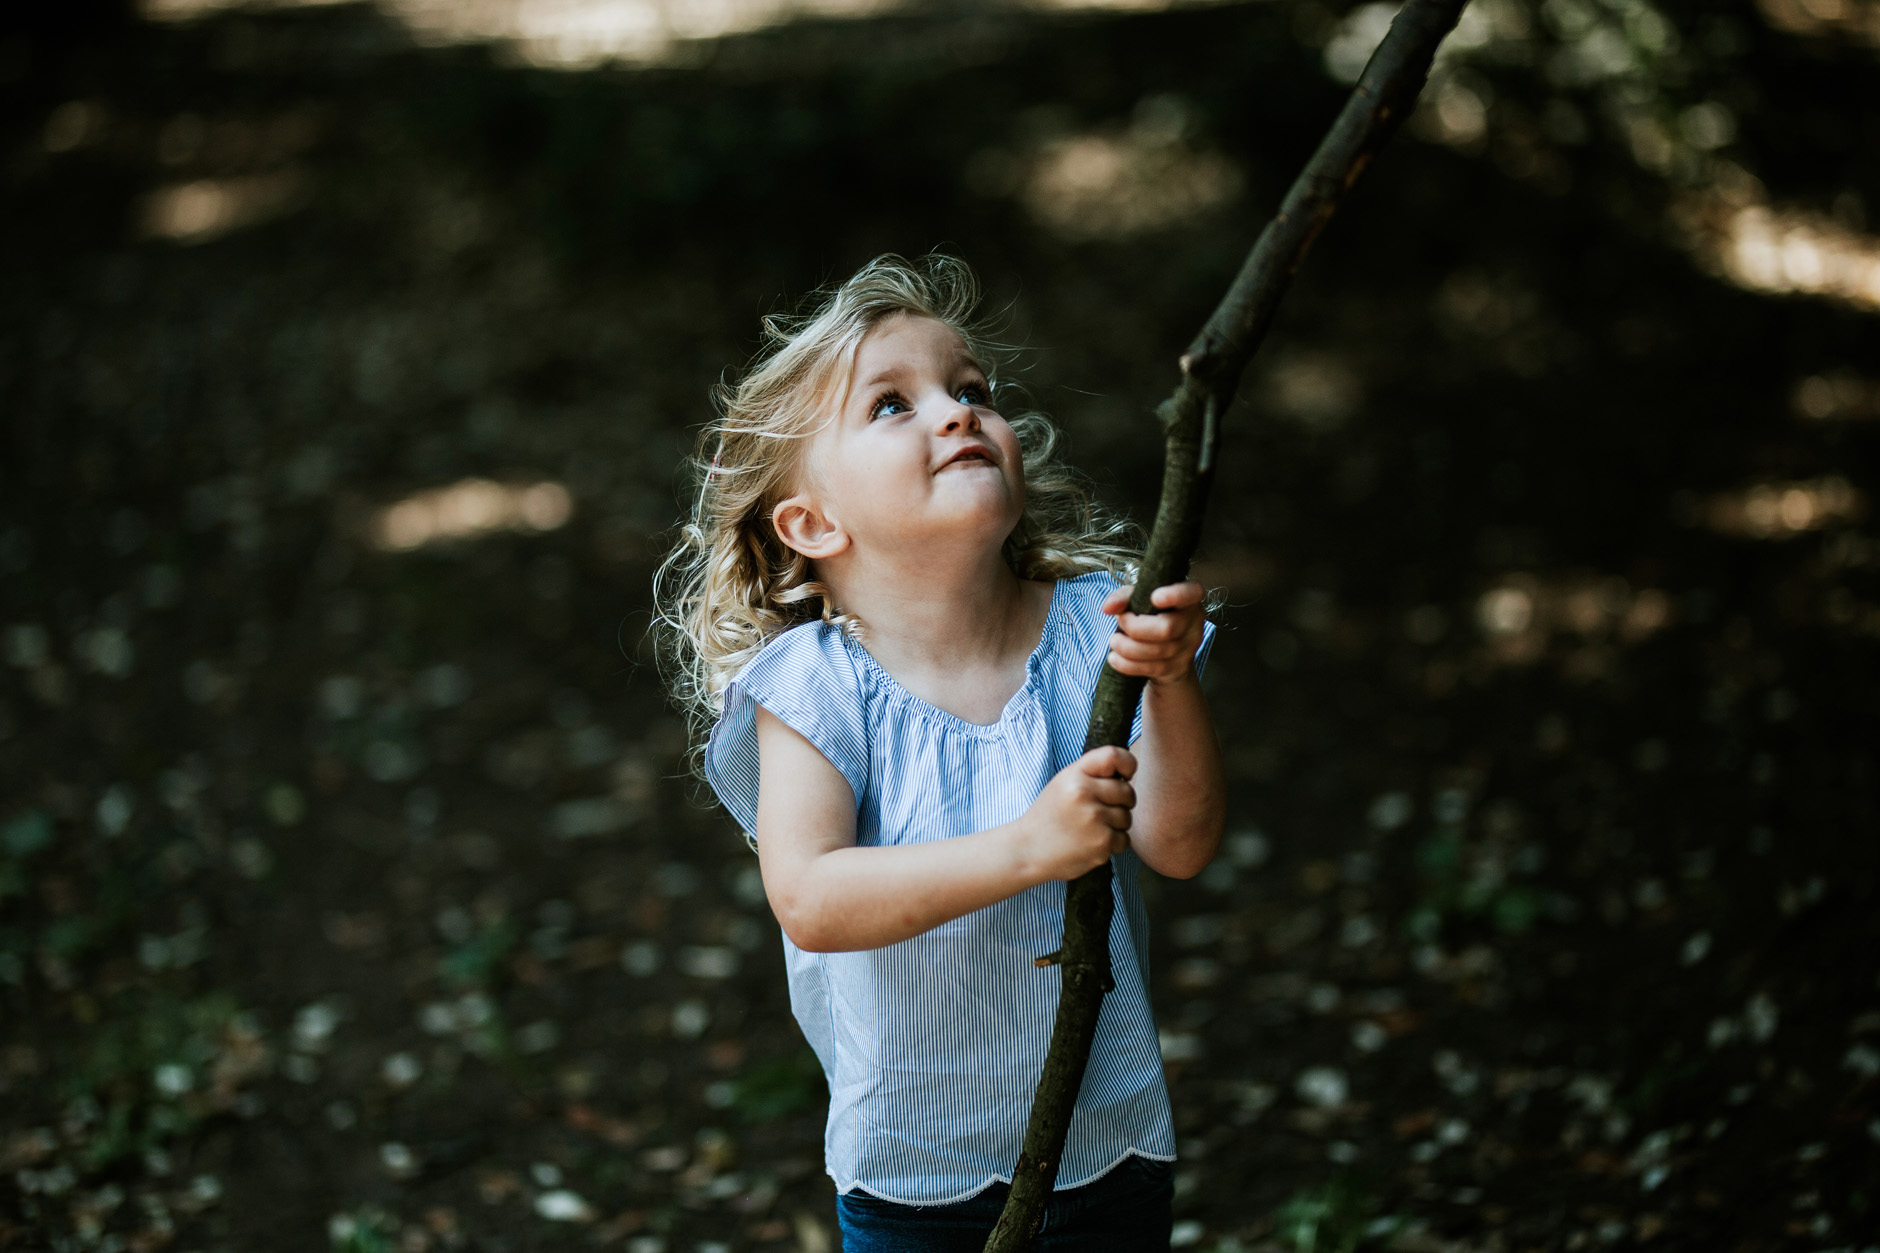 candid-natural-children-family-photographer-dublin-0044.jpg